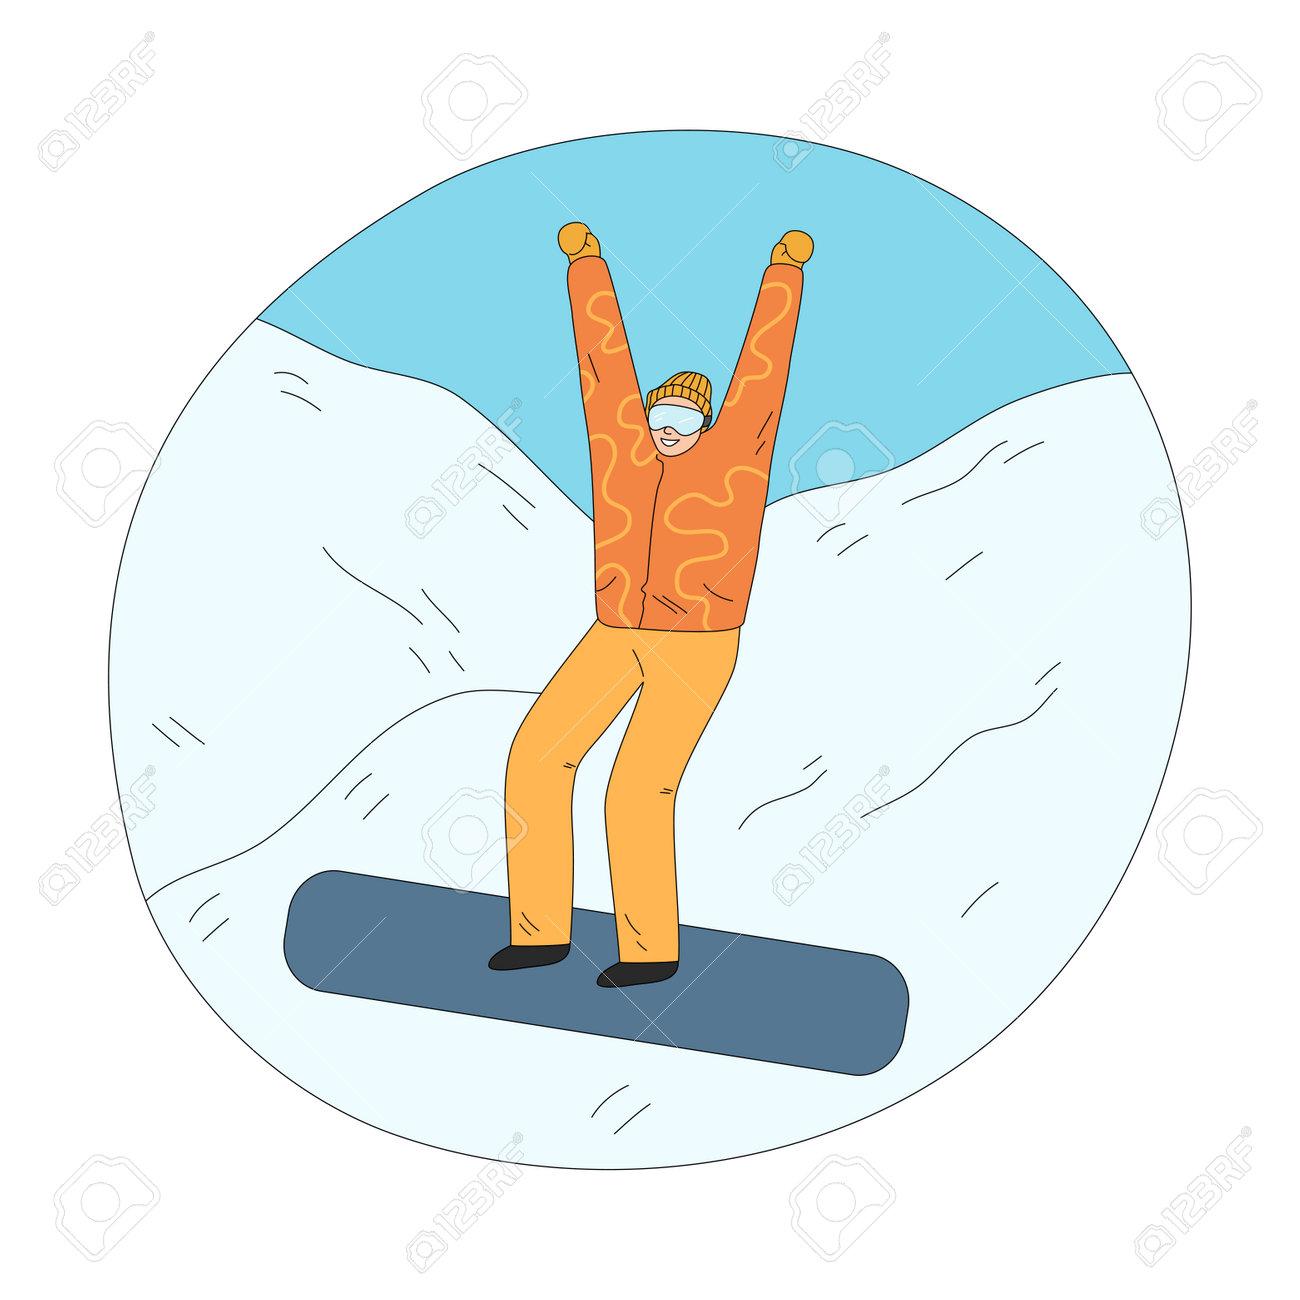 Man in orange winter sportswear feeling cheerful downhill during snowboarding - 162070067